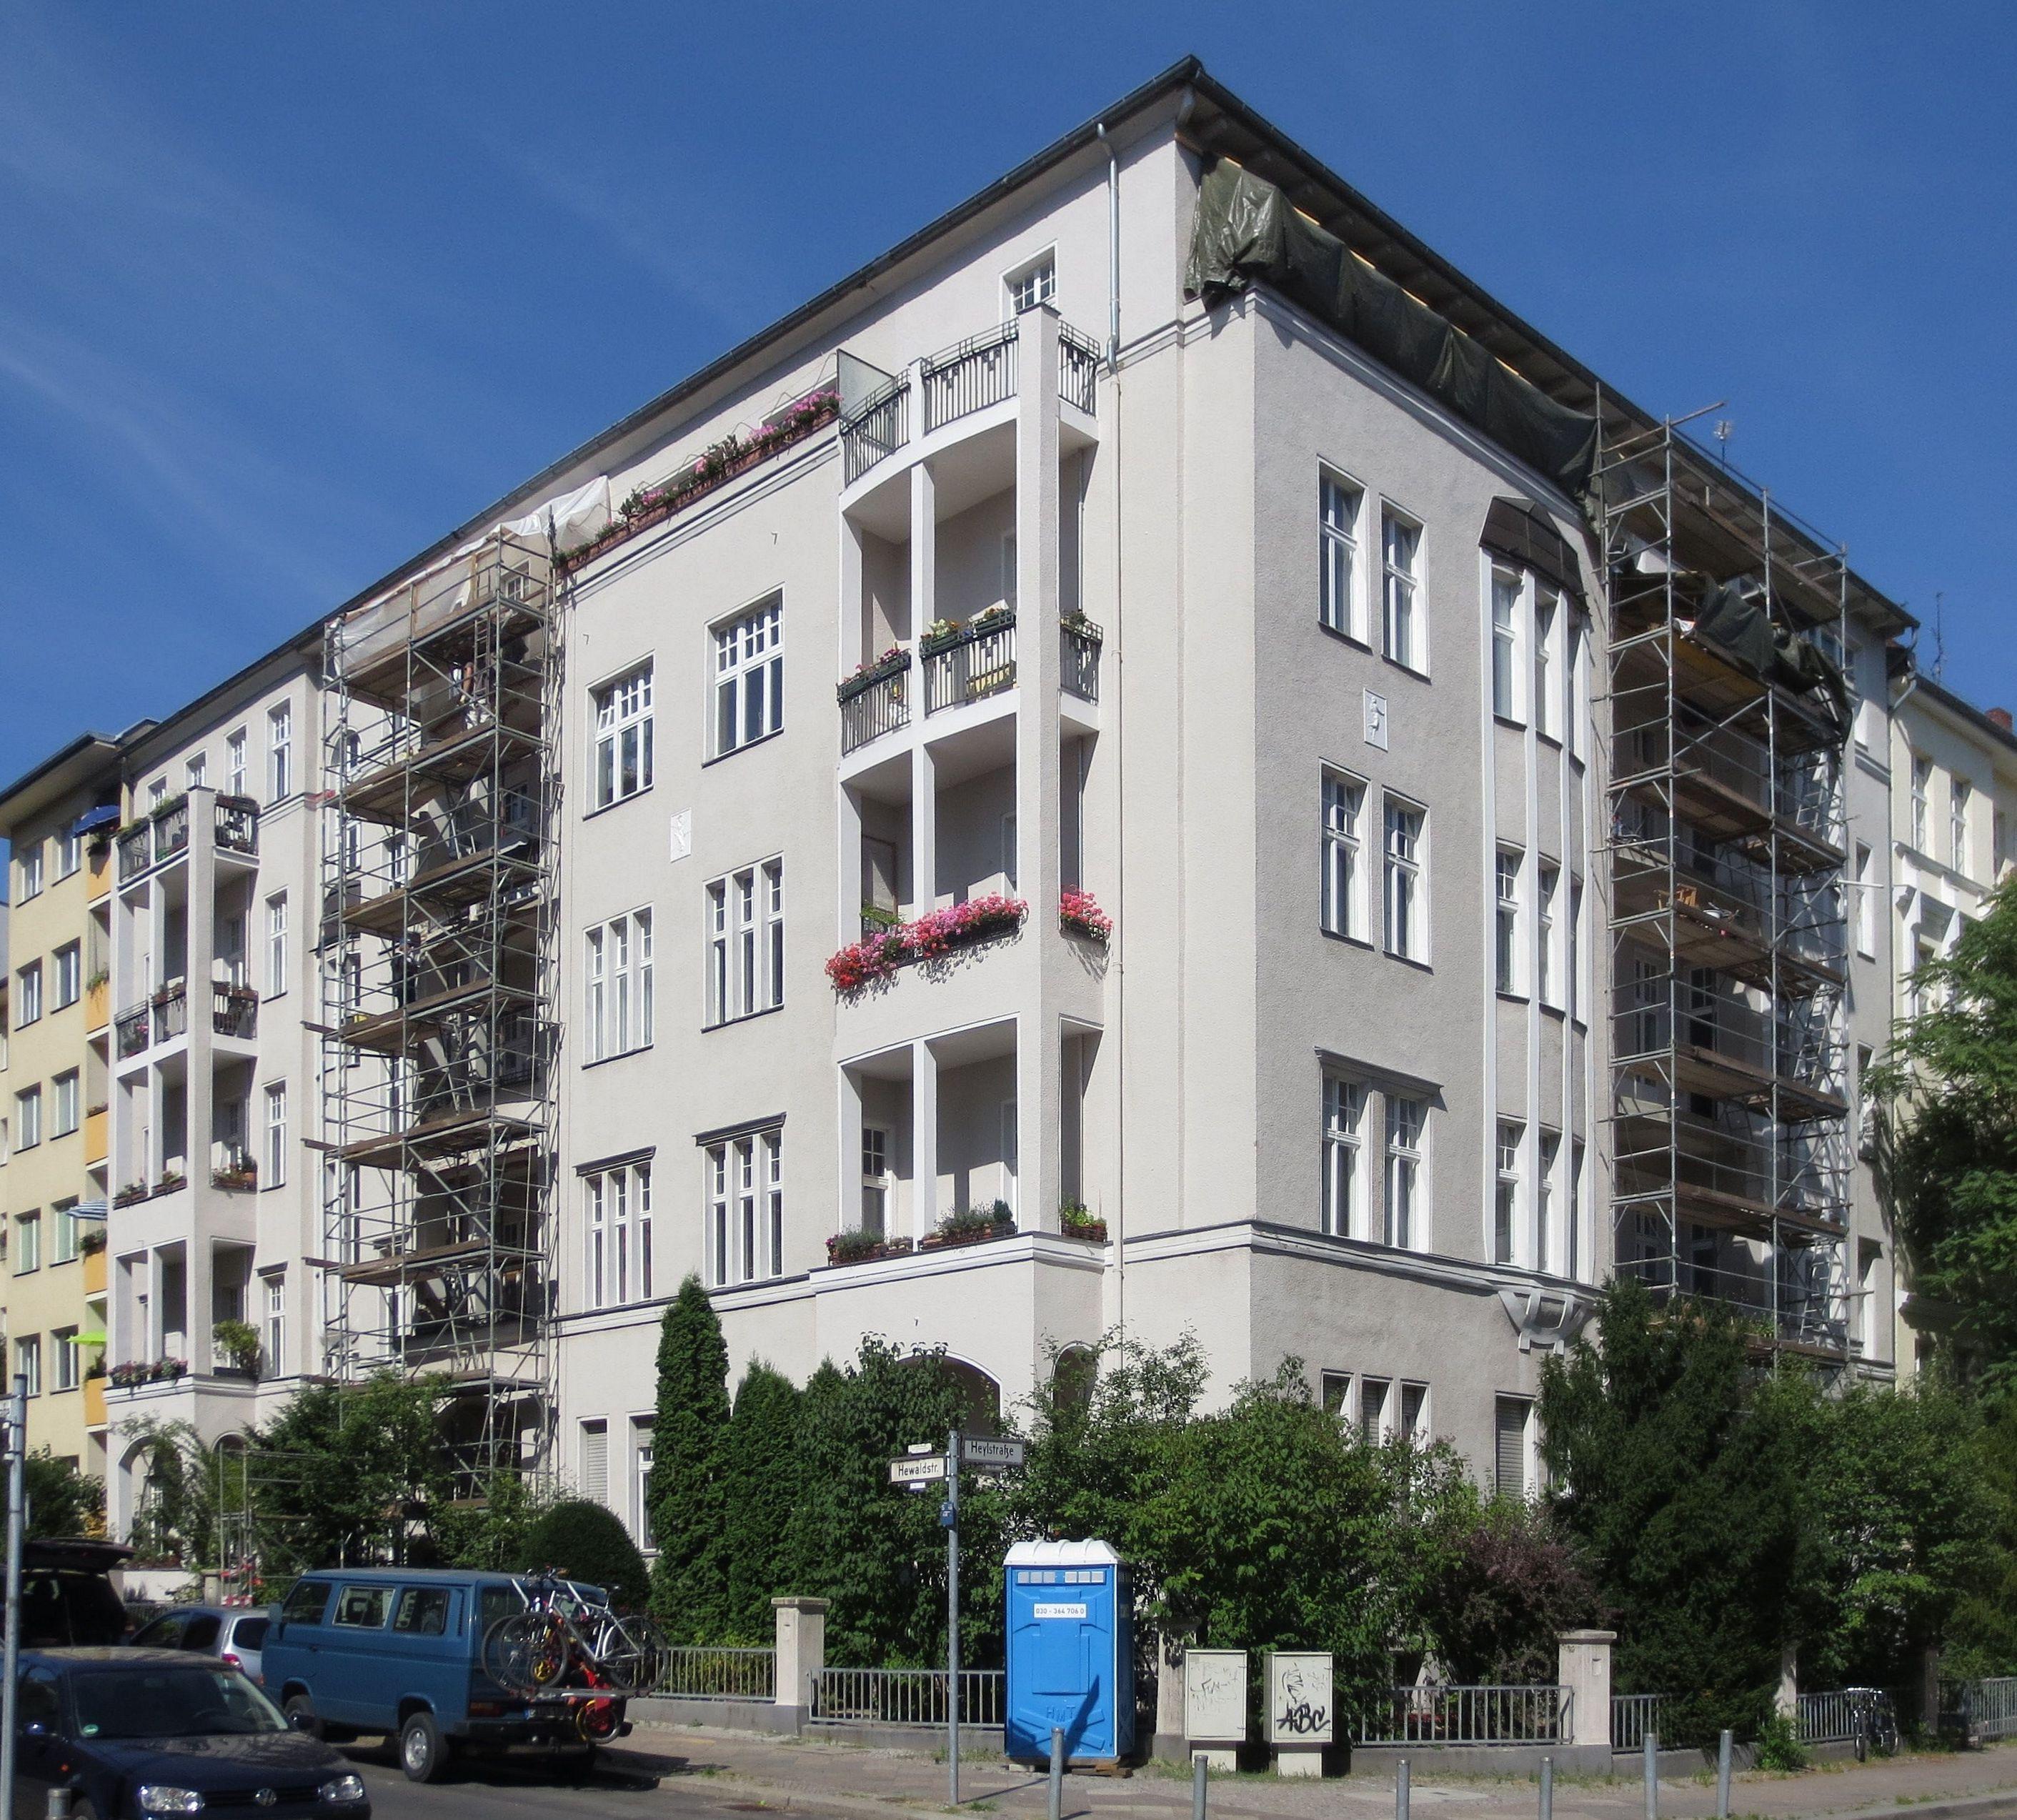 file berlin schoeneberg hewaldstrasse 7 wikimedia commons. Black Bedroom Furniture Sets. Home Design Ideas